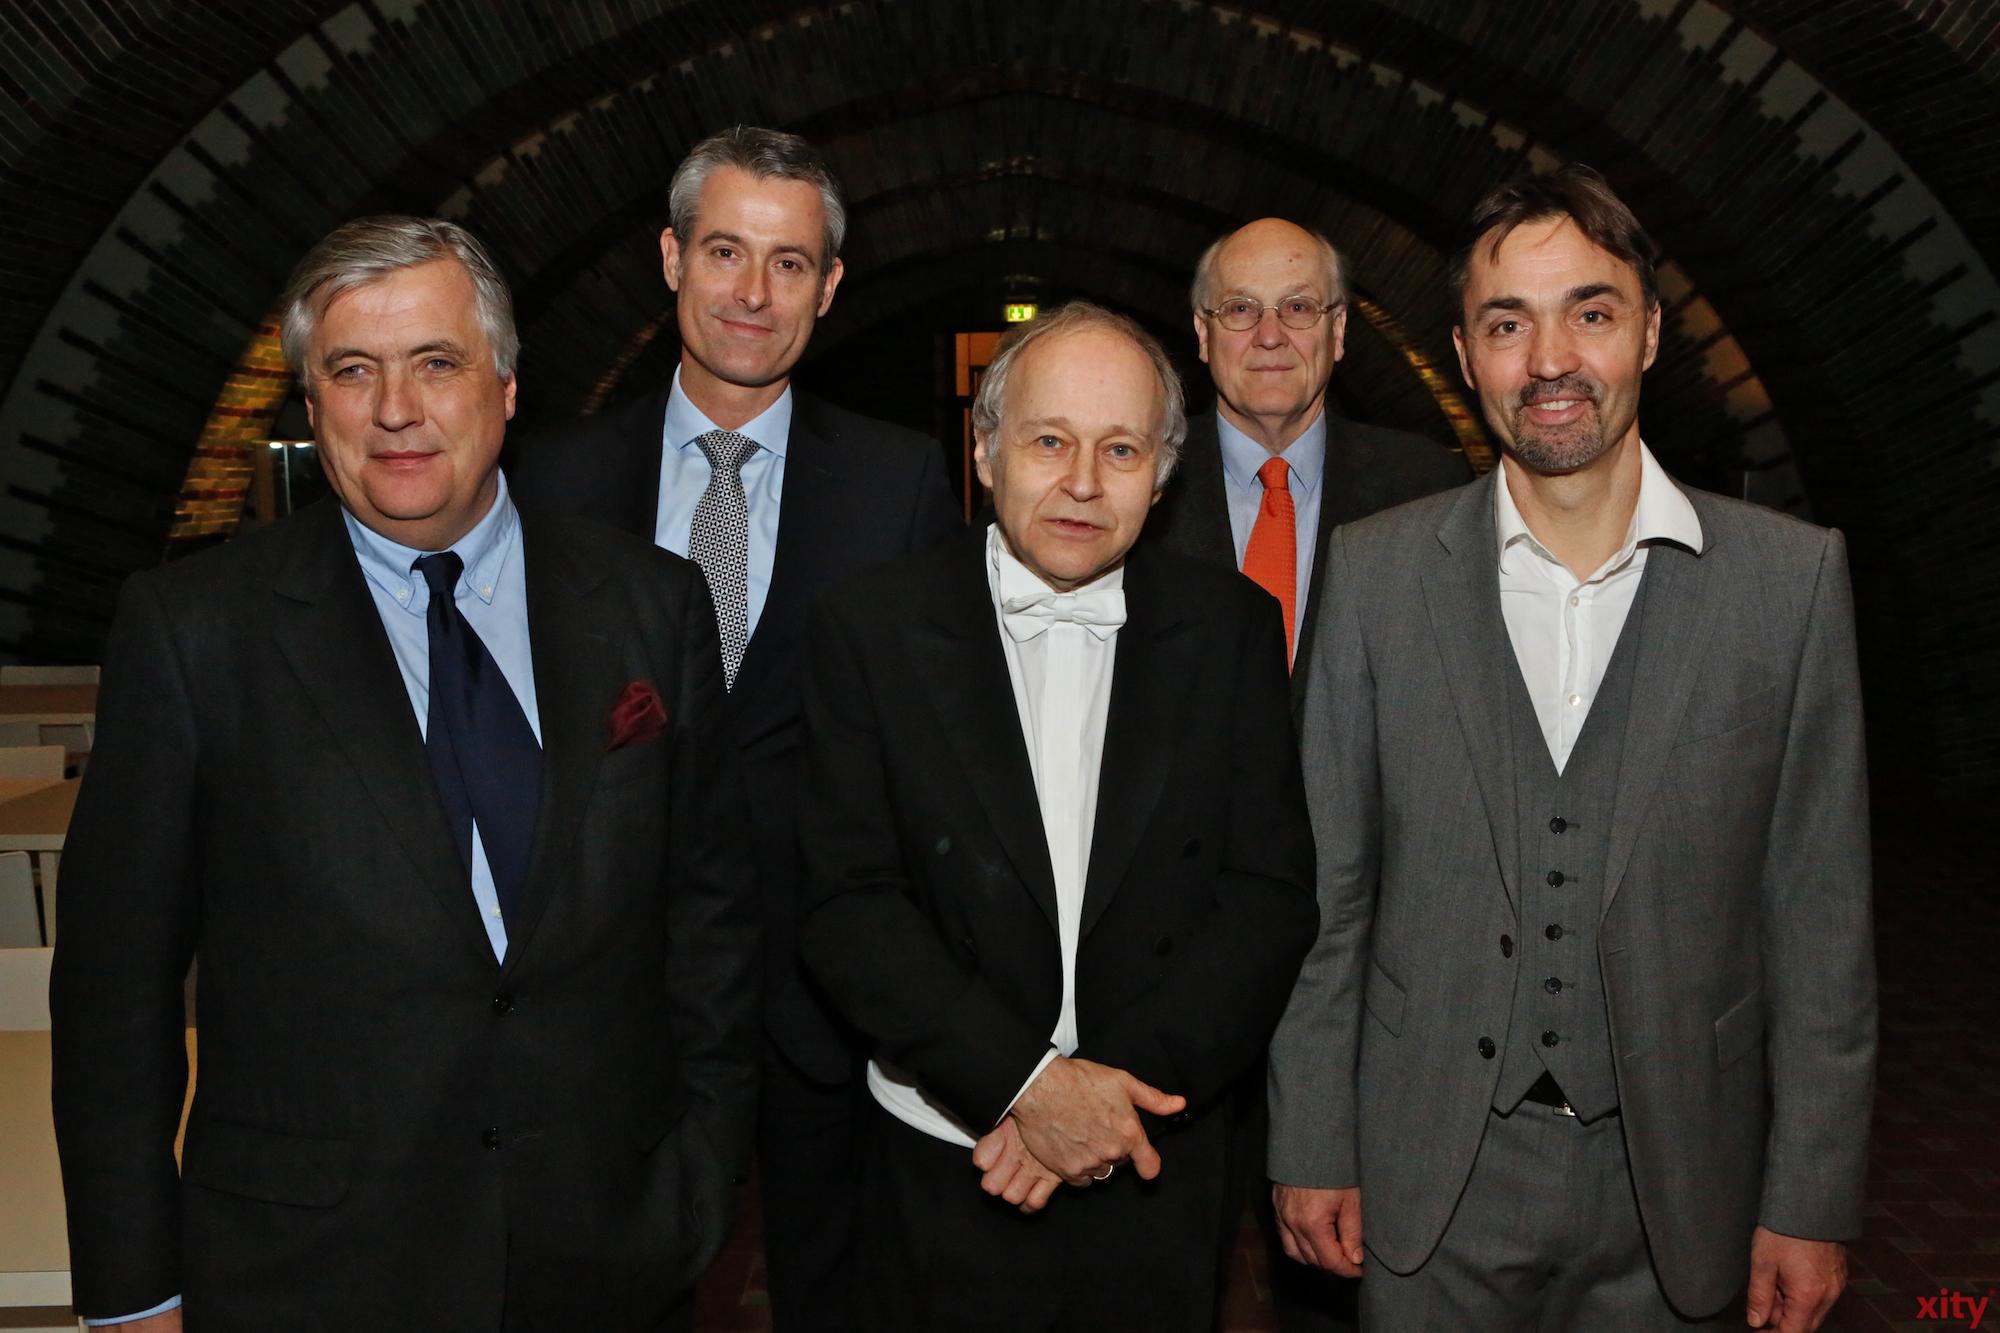 (v.l.) Patrick Schwarz-Schütte, Michael Becker, Adam Fischer und Dr. Stefan Krieger (Foto: xity)